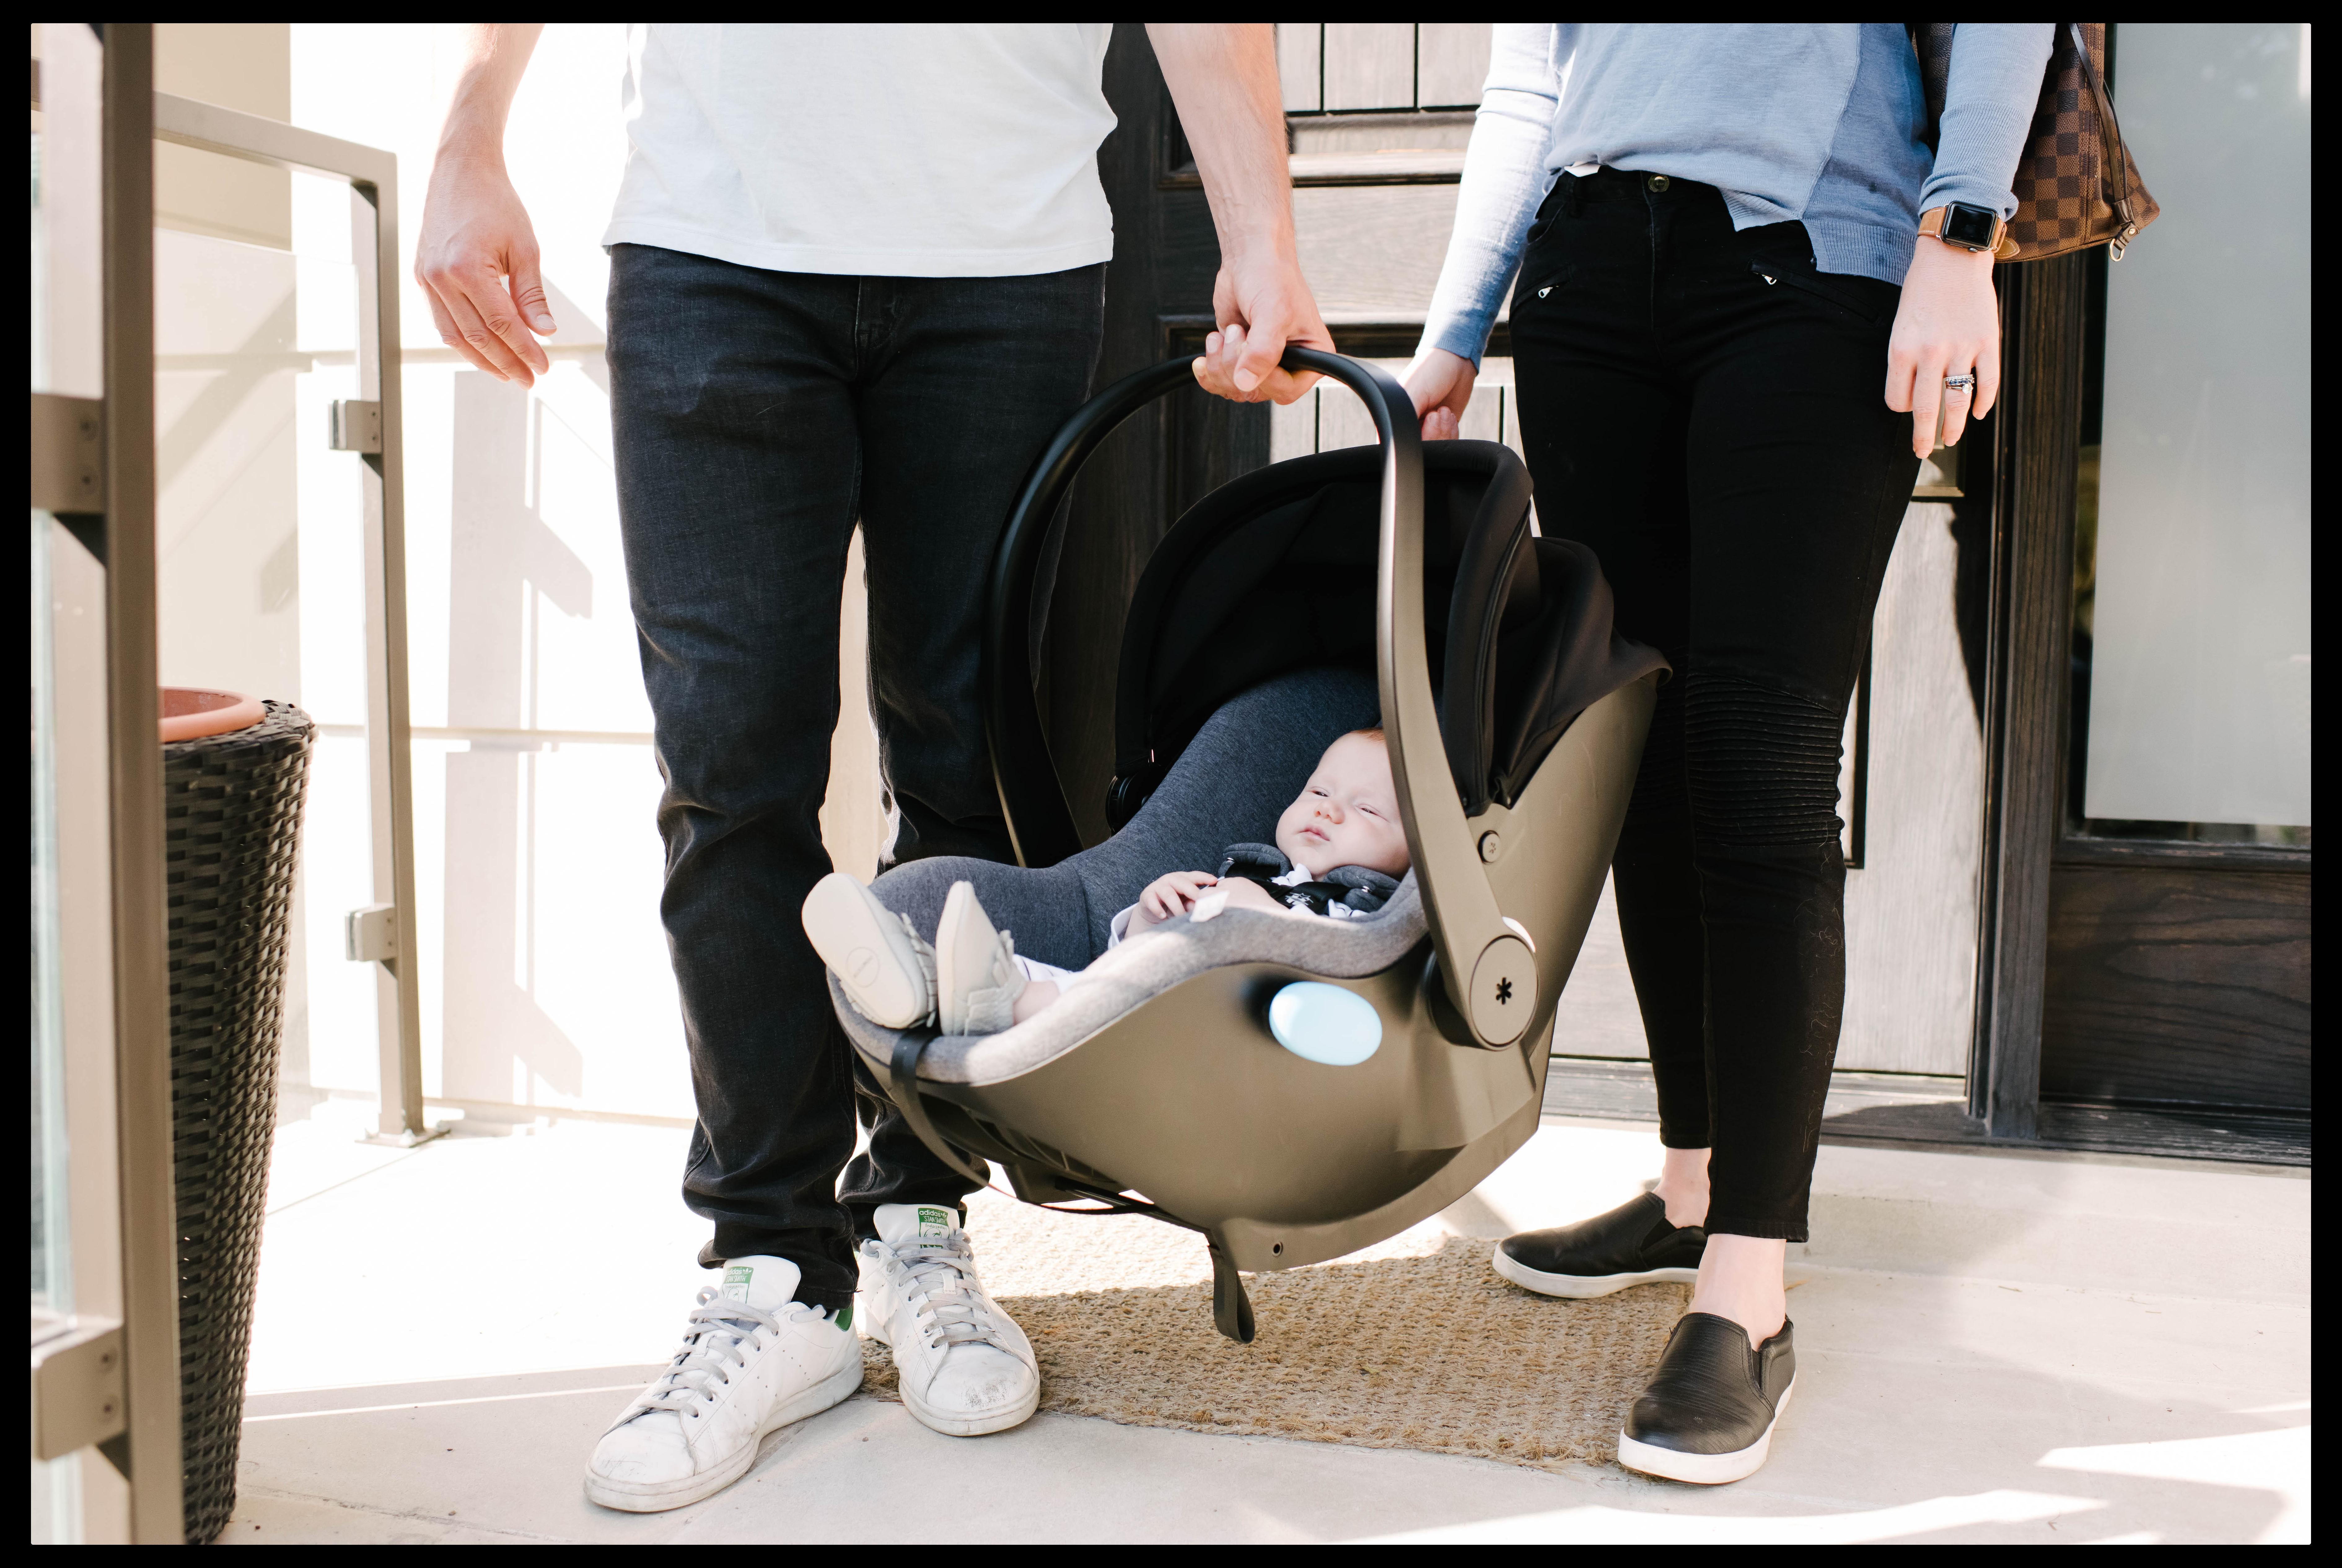 New Clek Liing Infant Car Seat